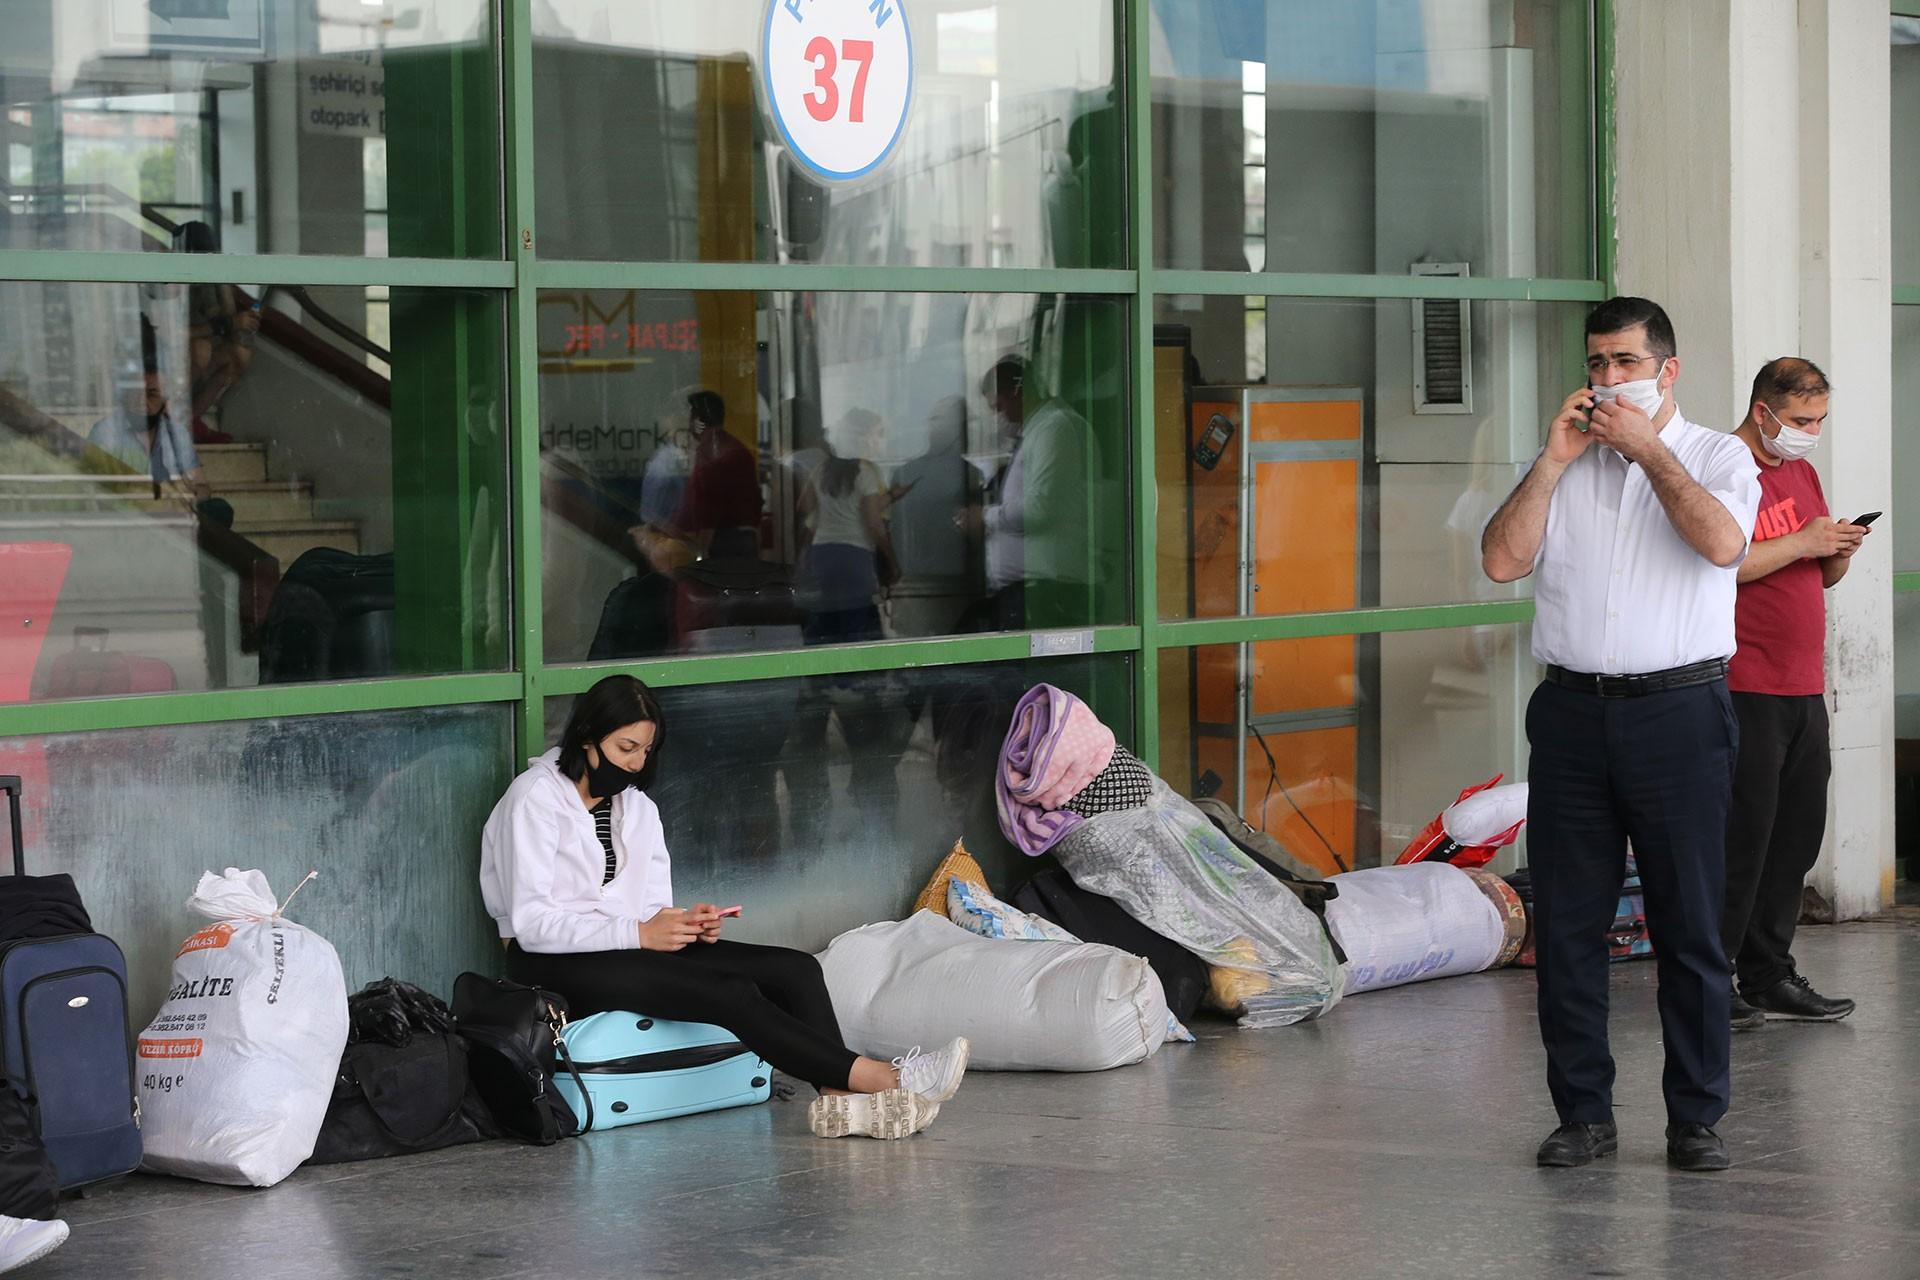 Otobüs terminalinde bekleyen yolcular